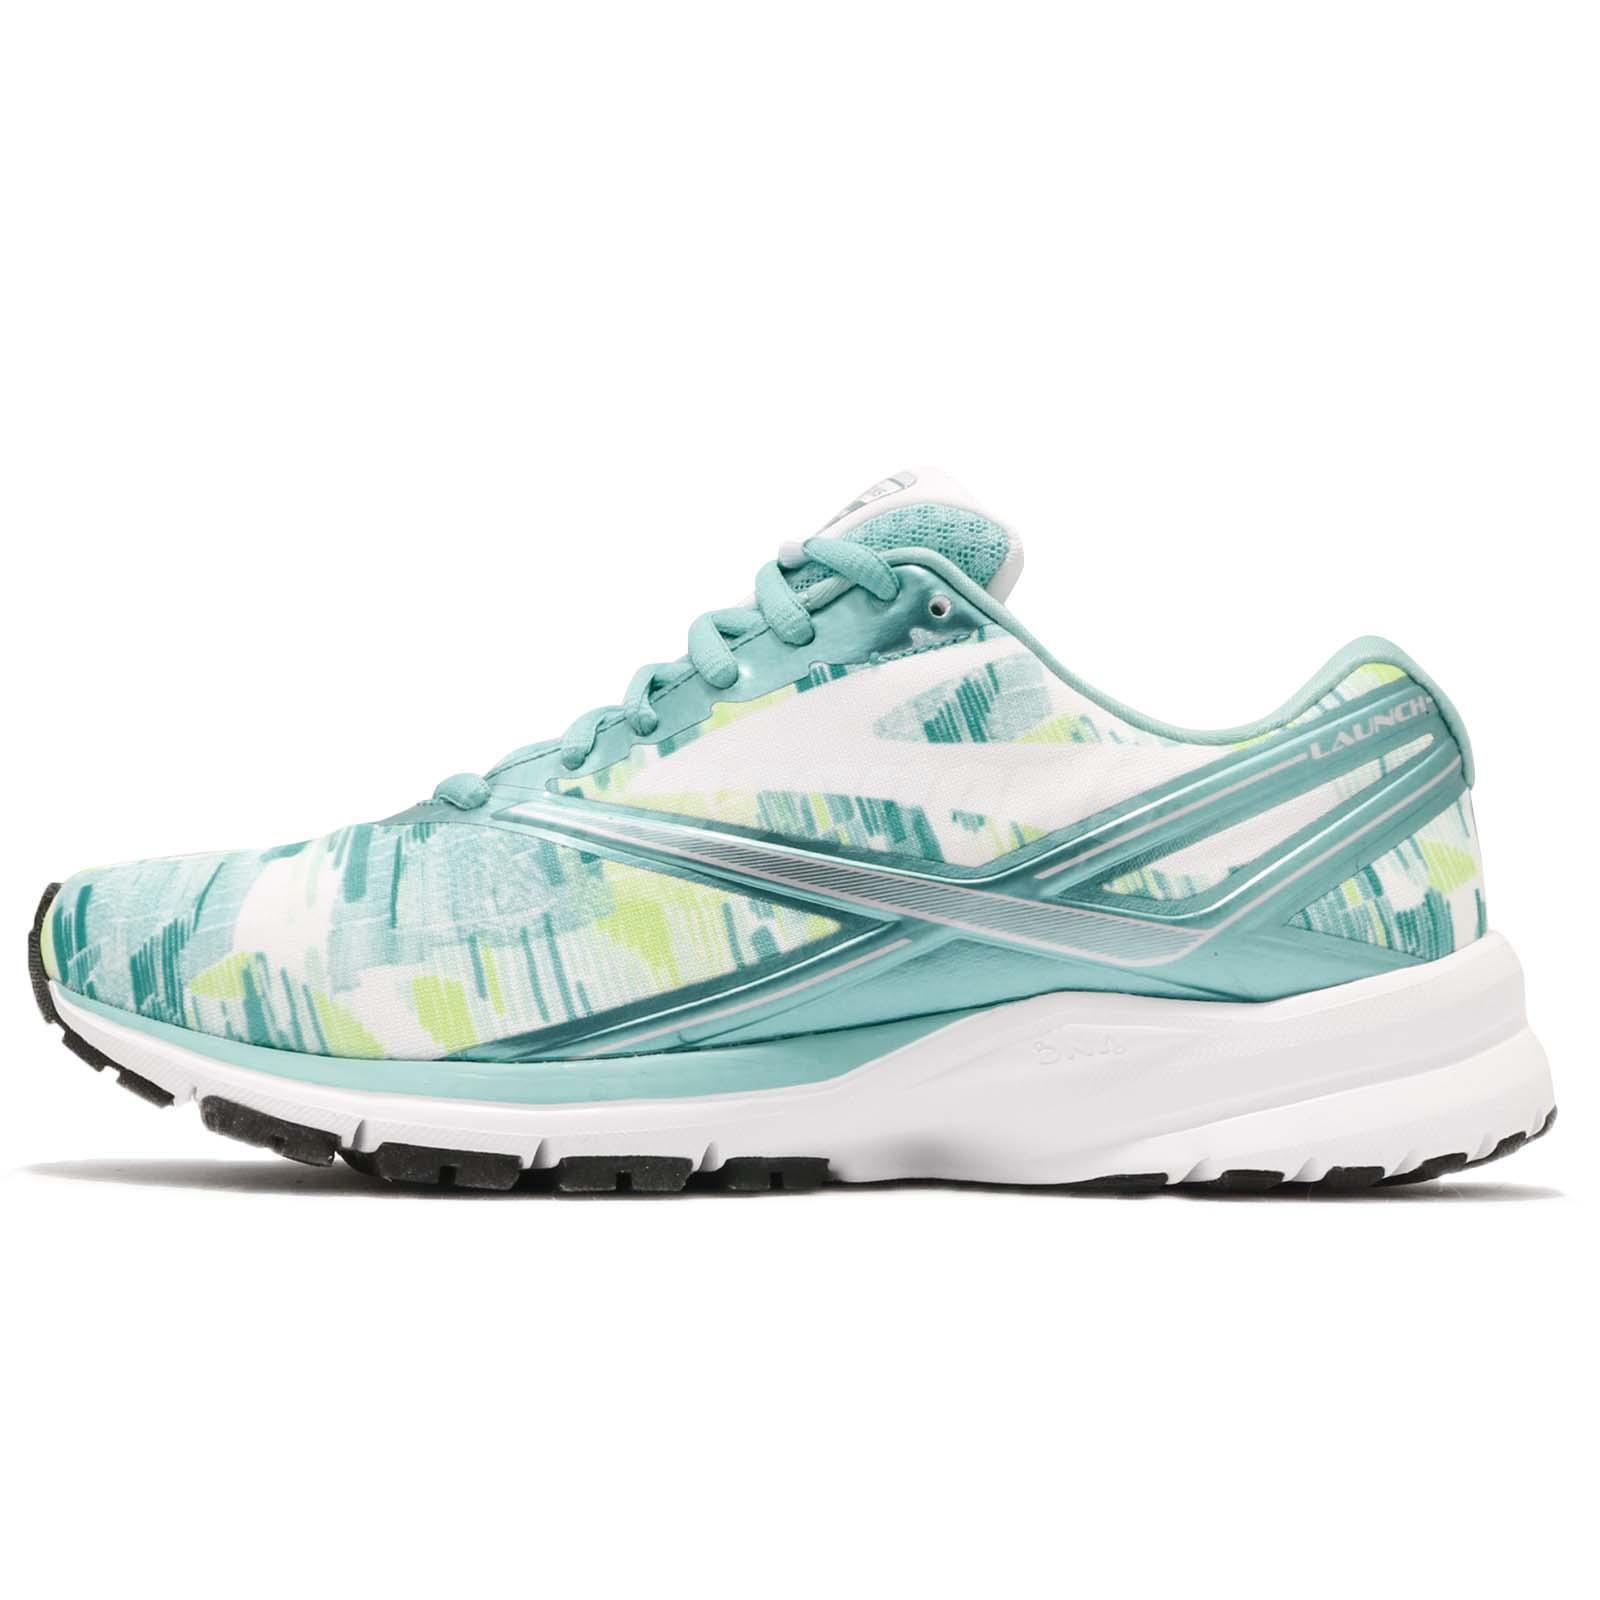 ae2667ecc79 Brooks Launch 4 Kasbah Blue Radiance White Women Running Shoes Sneaker  120234 1B